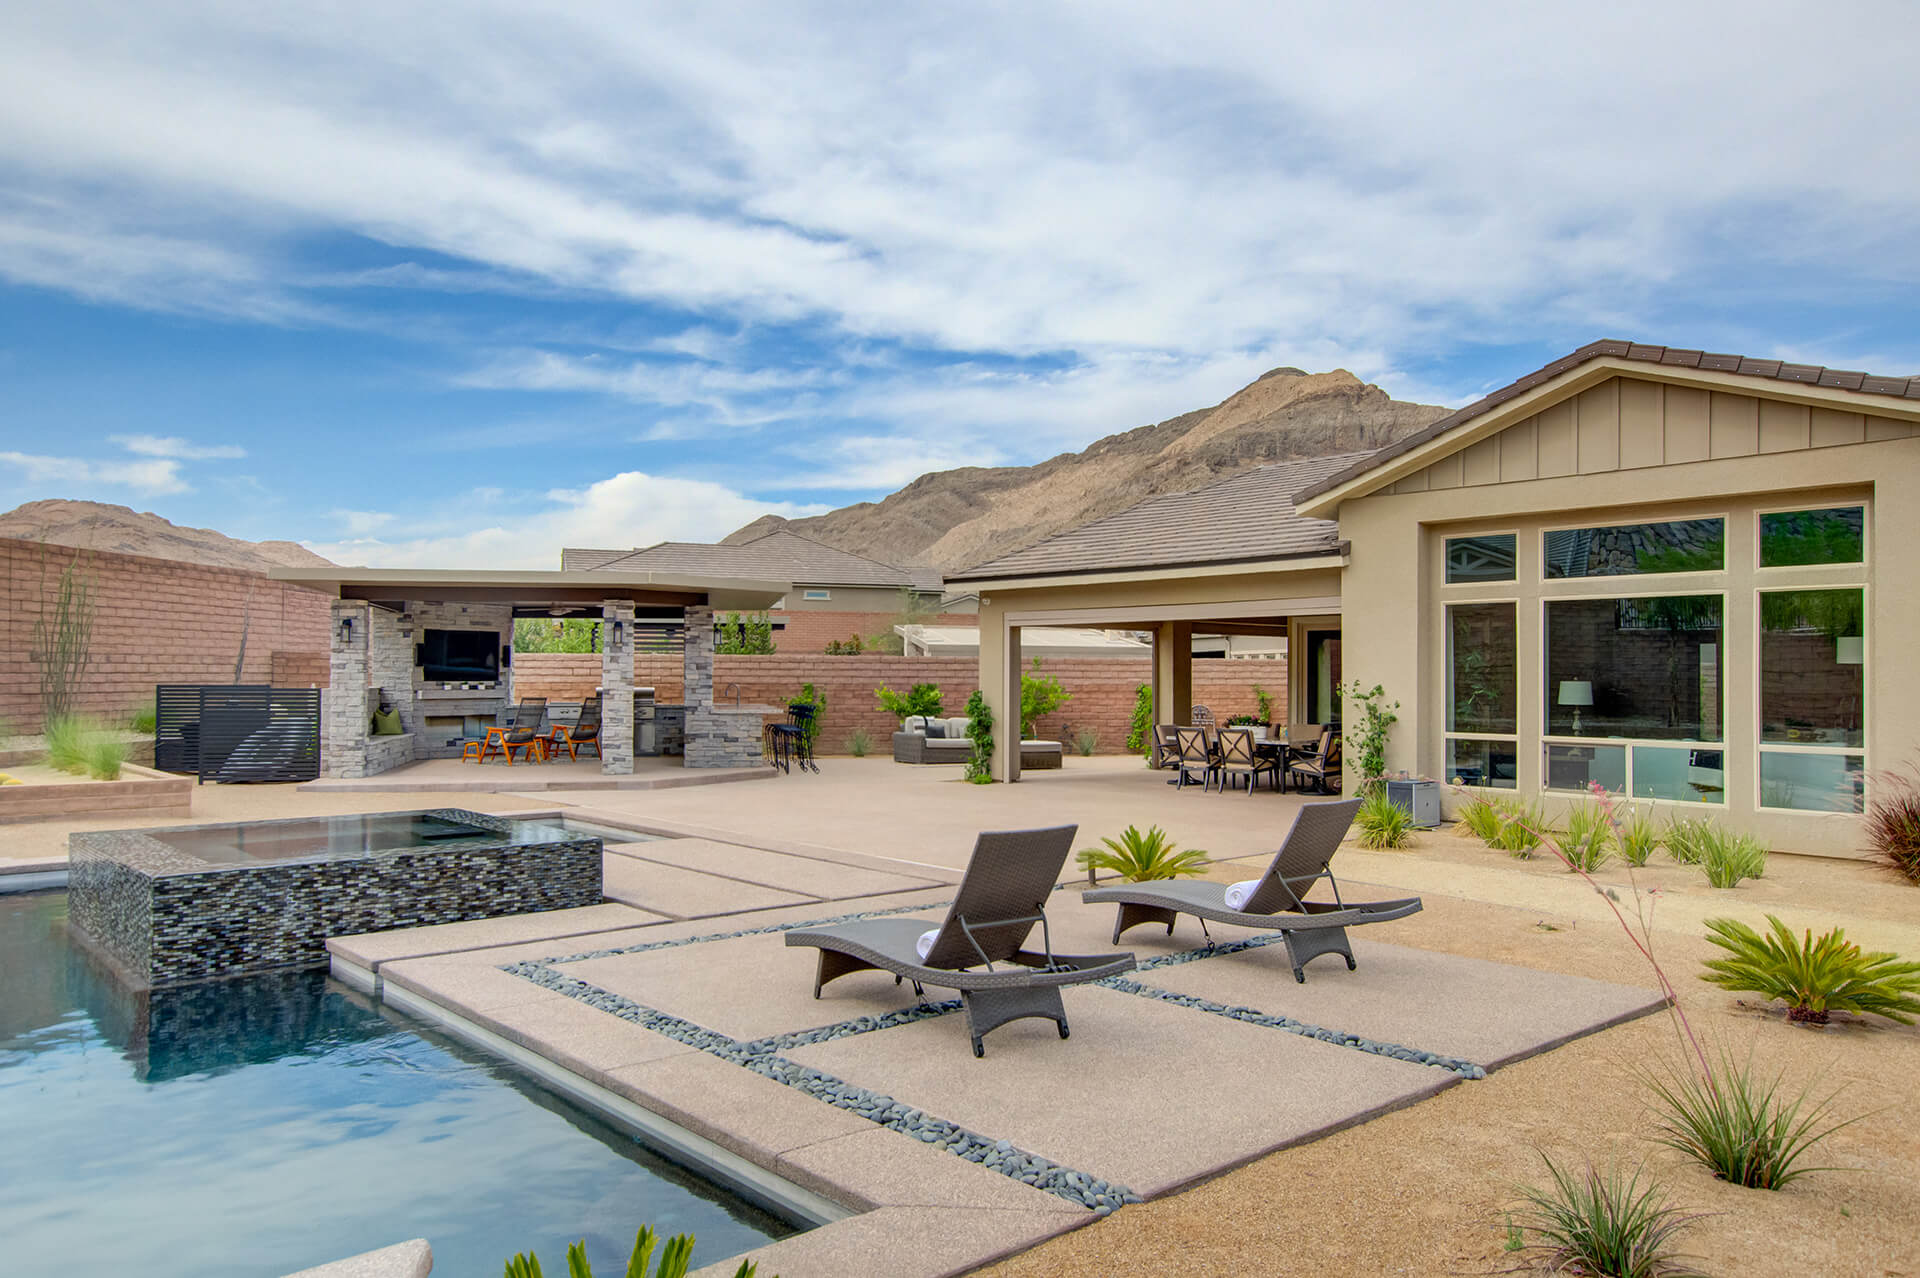 Desert Oasis Outdoor Kitchen & Outdoor Living Area Project ... on Custom Outdoor Living id=19691